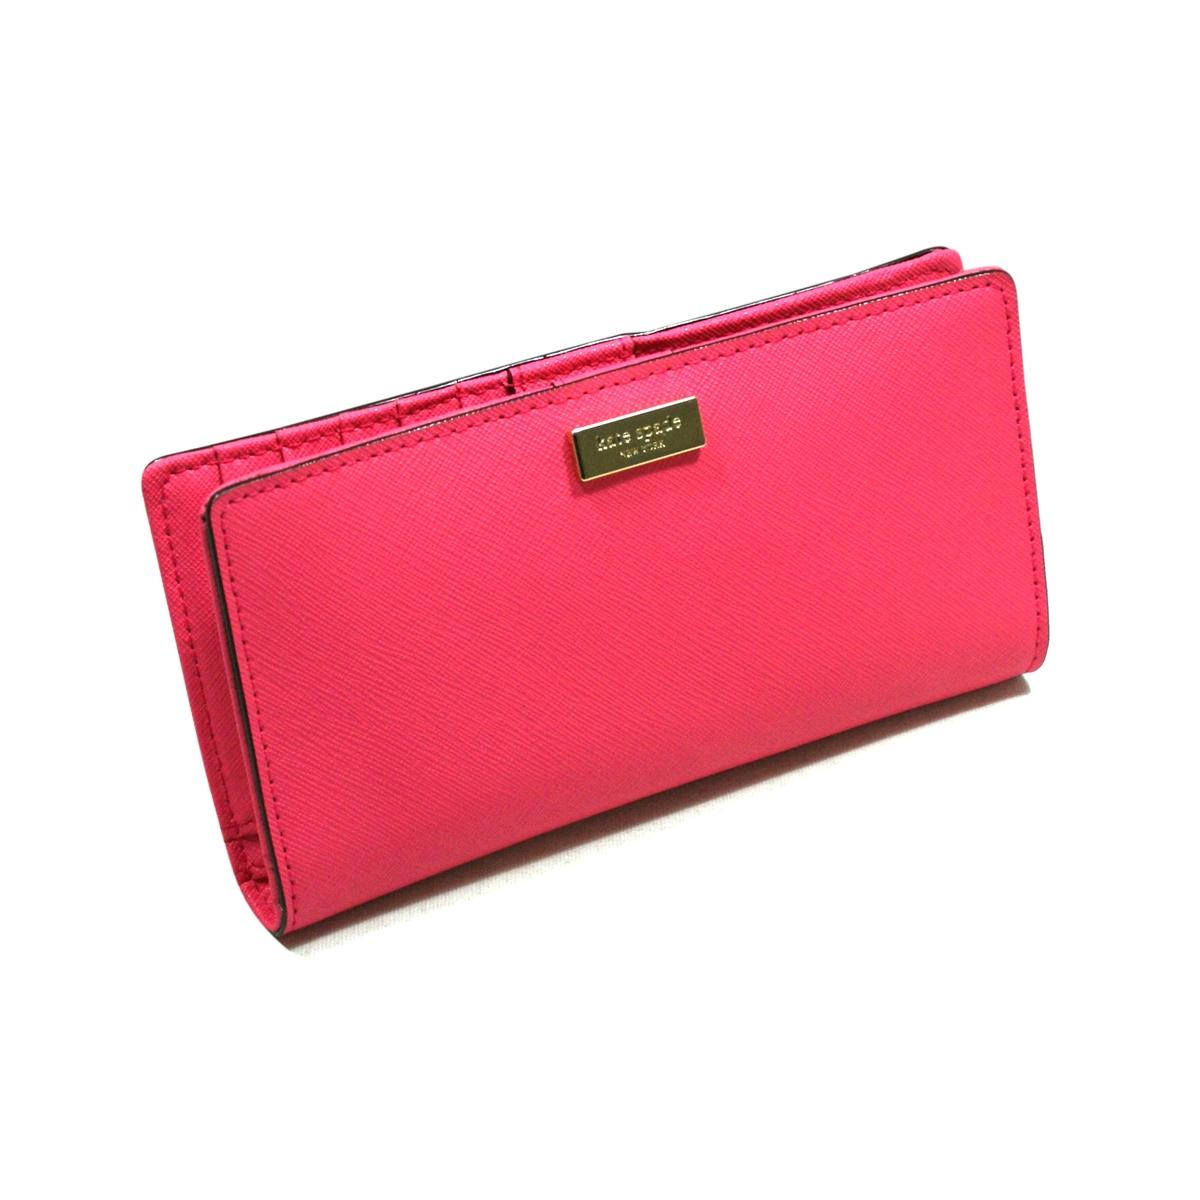 Kate Spade Stacy Newbury Lane Wallet Clutch Bazooka Pink